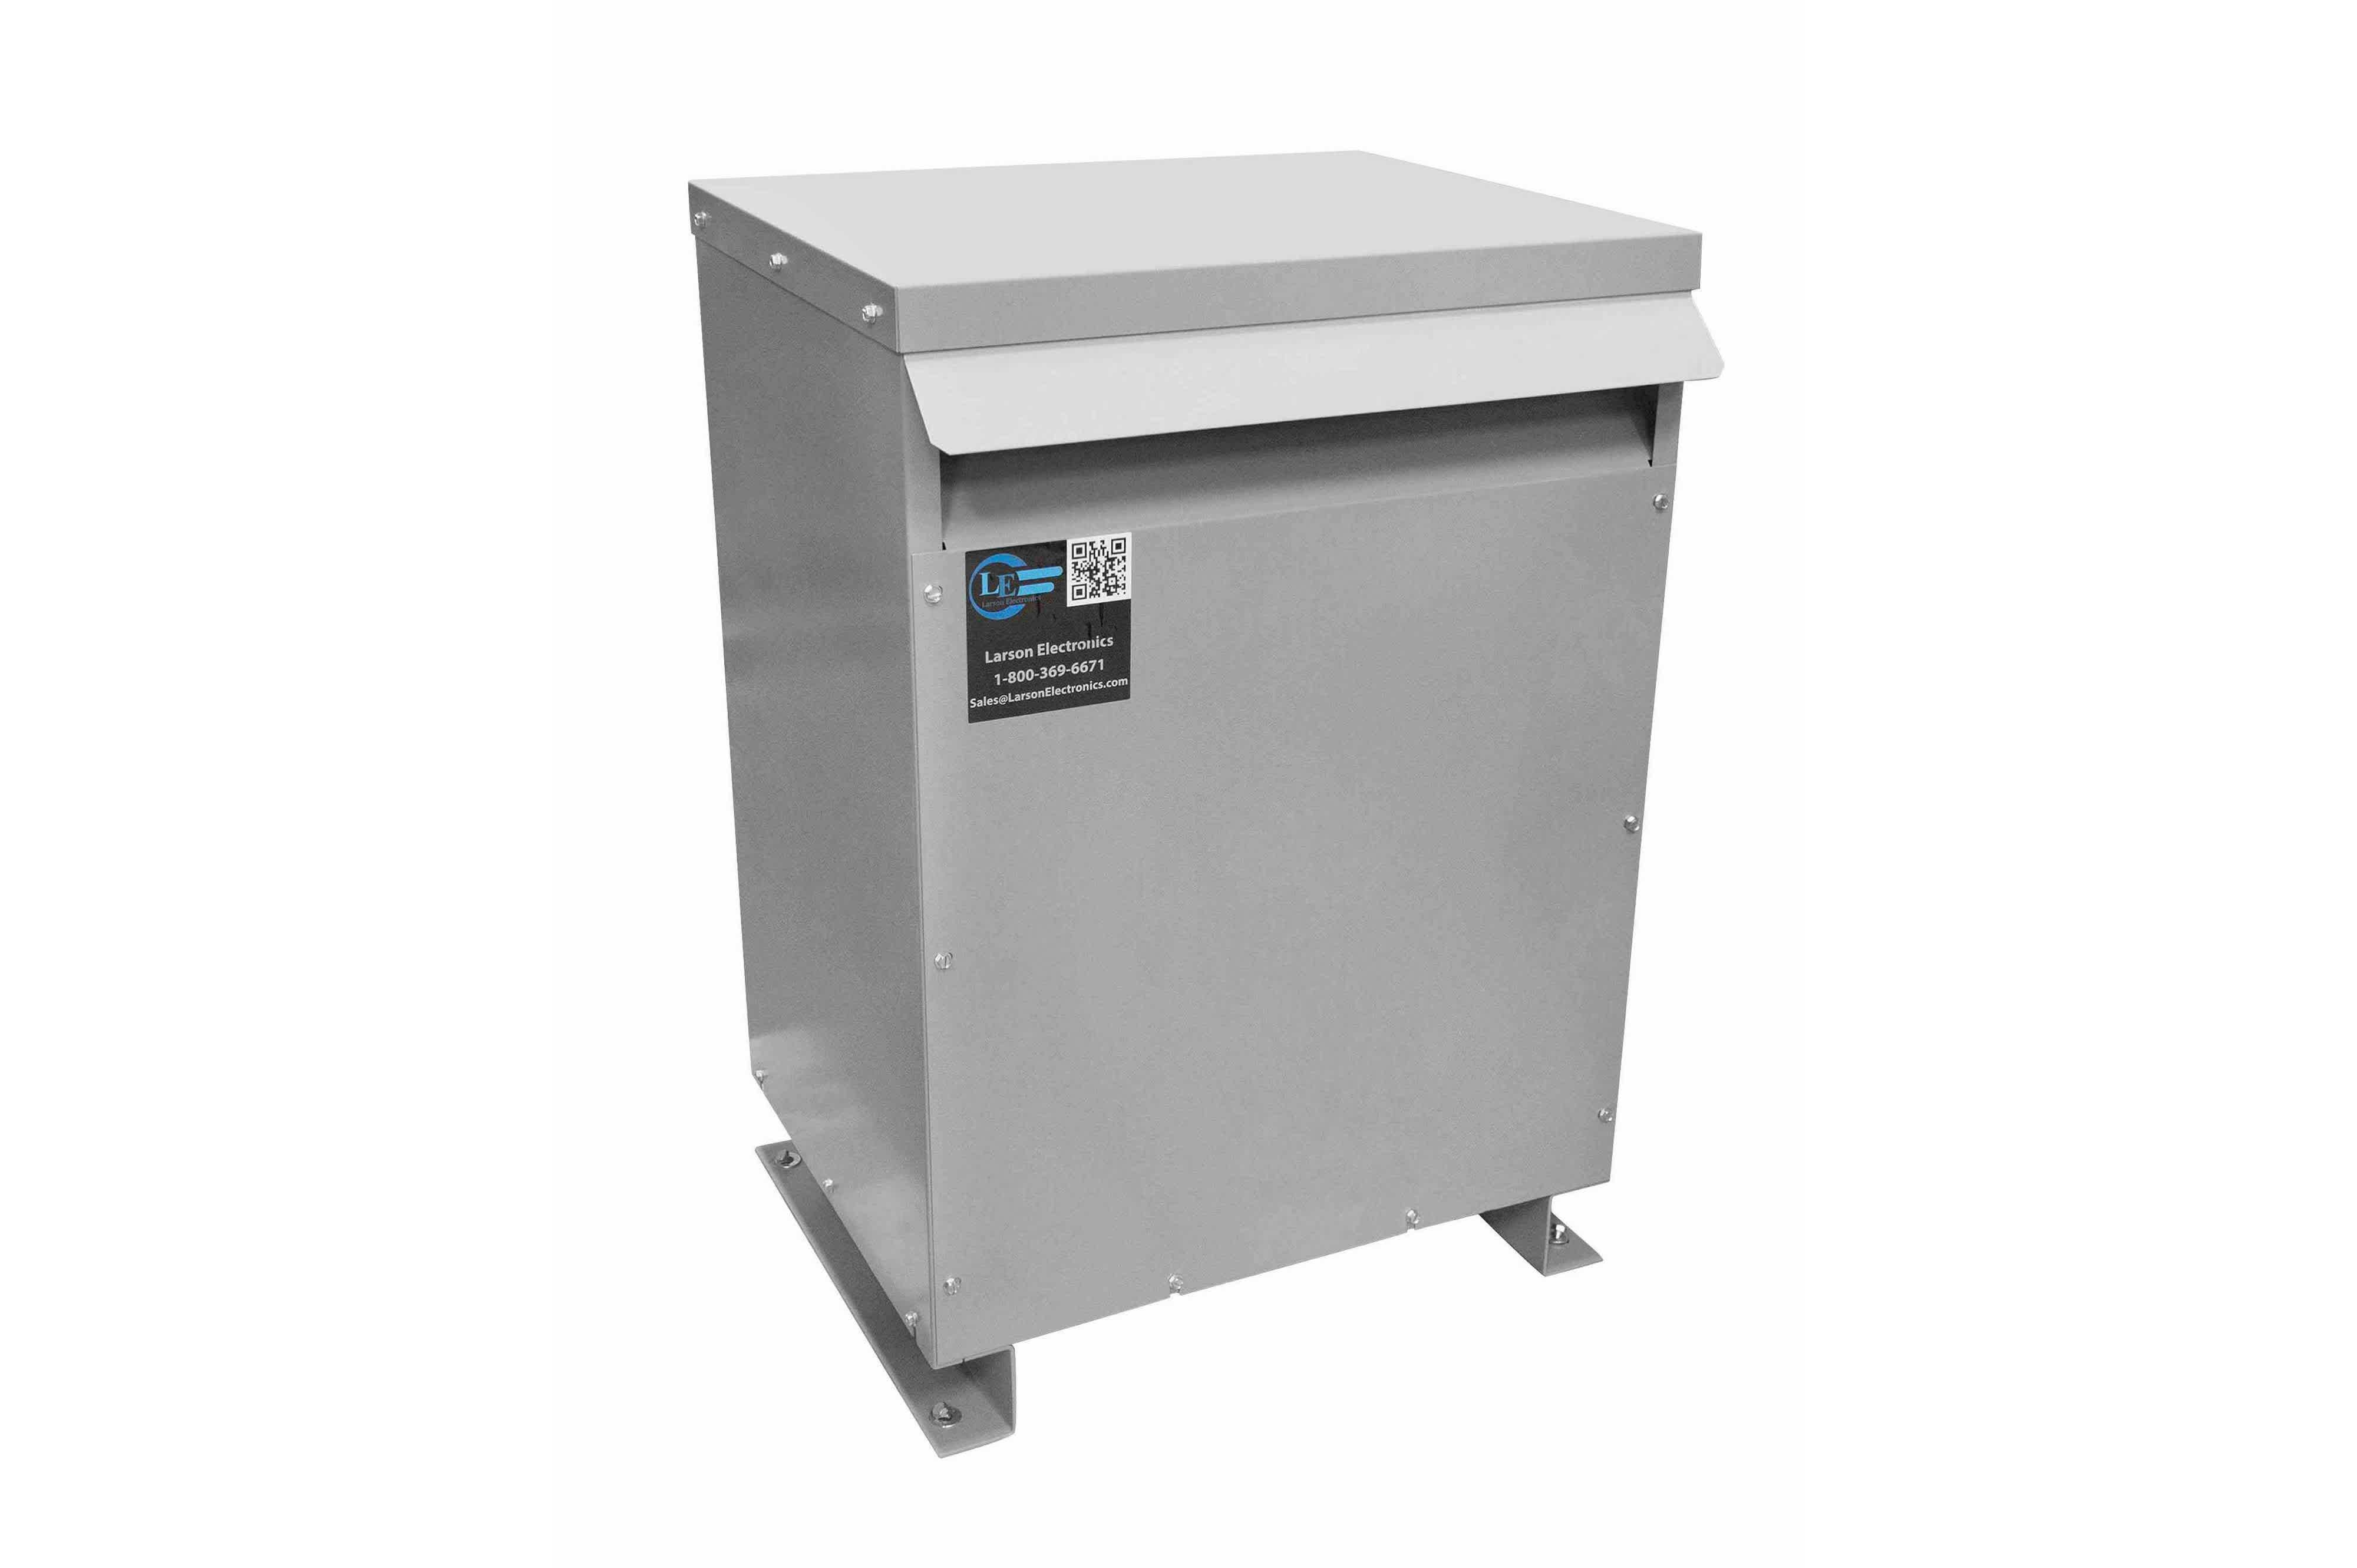 500 kVA 3PH Isolation Transformer, 600V Wye Primary, 240V/120 Delta Secondary, N3R, Ventilated, 60 Hz